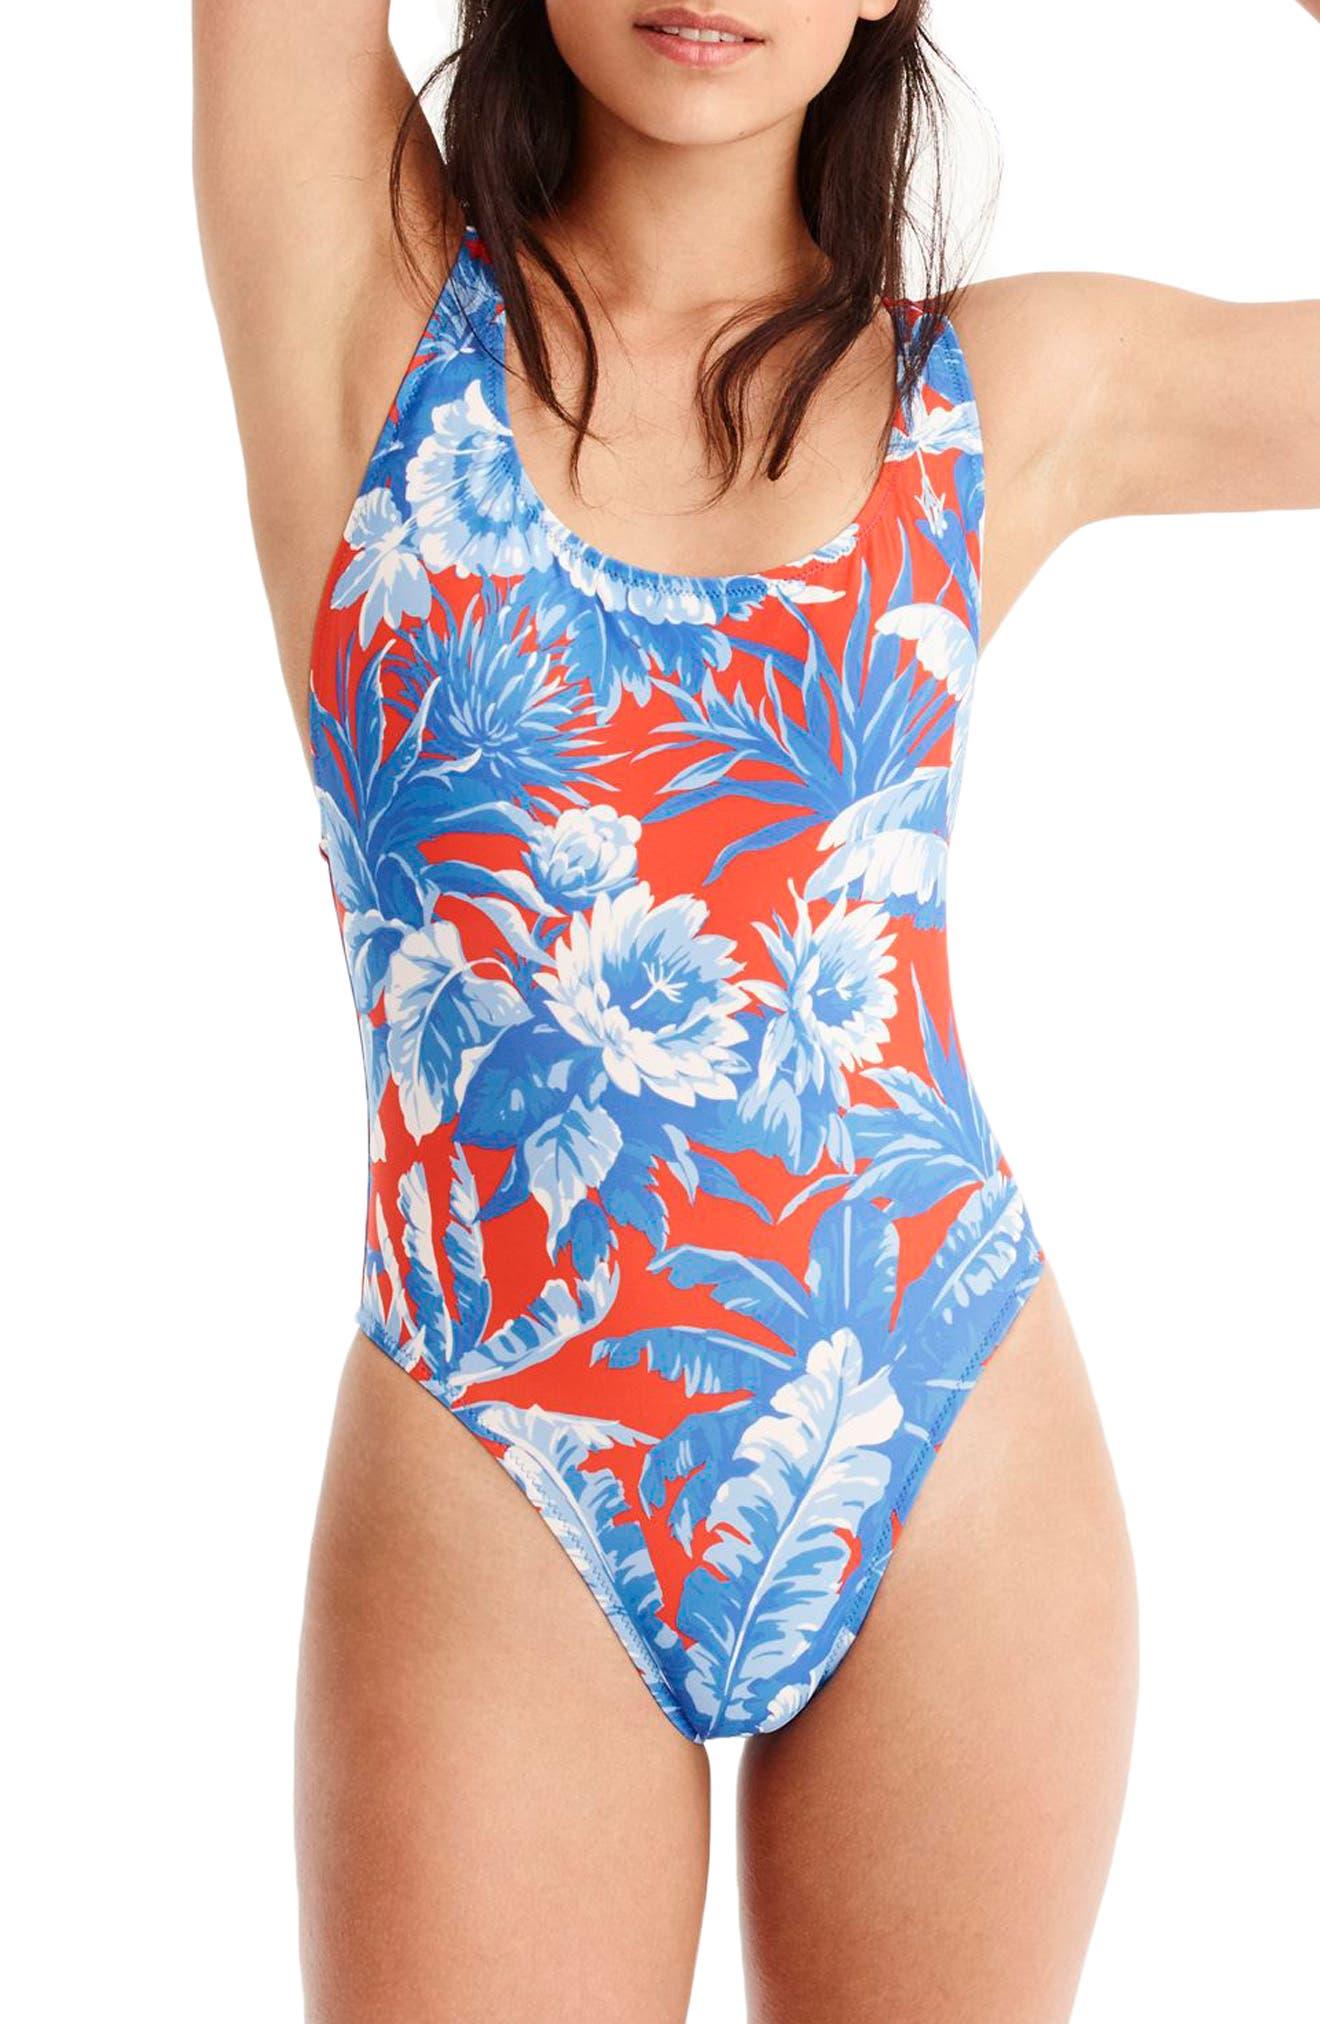 J.CREW Ratti Rio Floral One-Piece Swimsuit, Main, color, 400